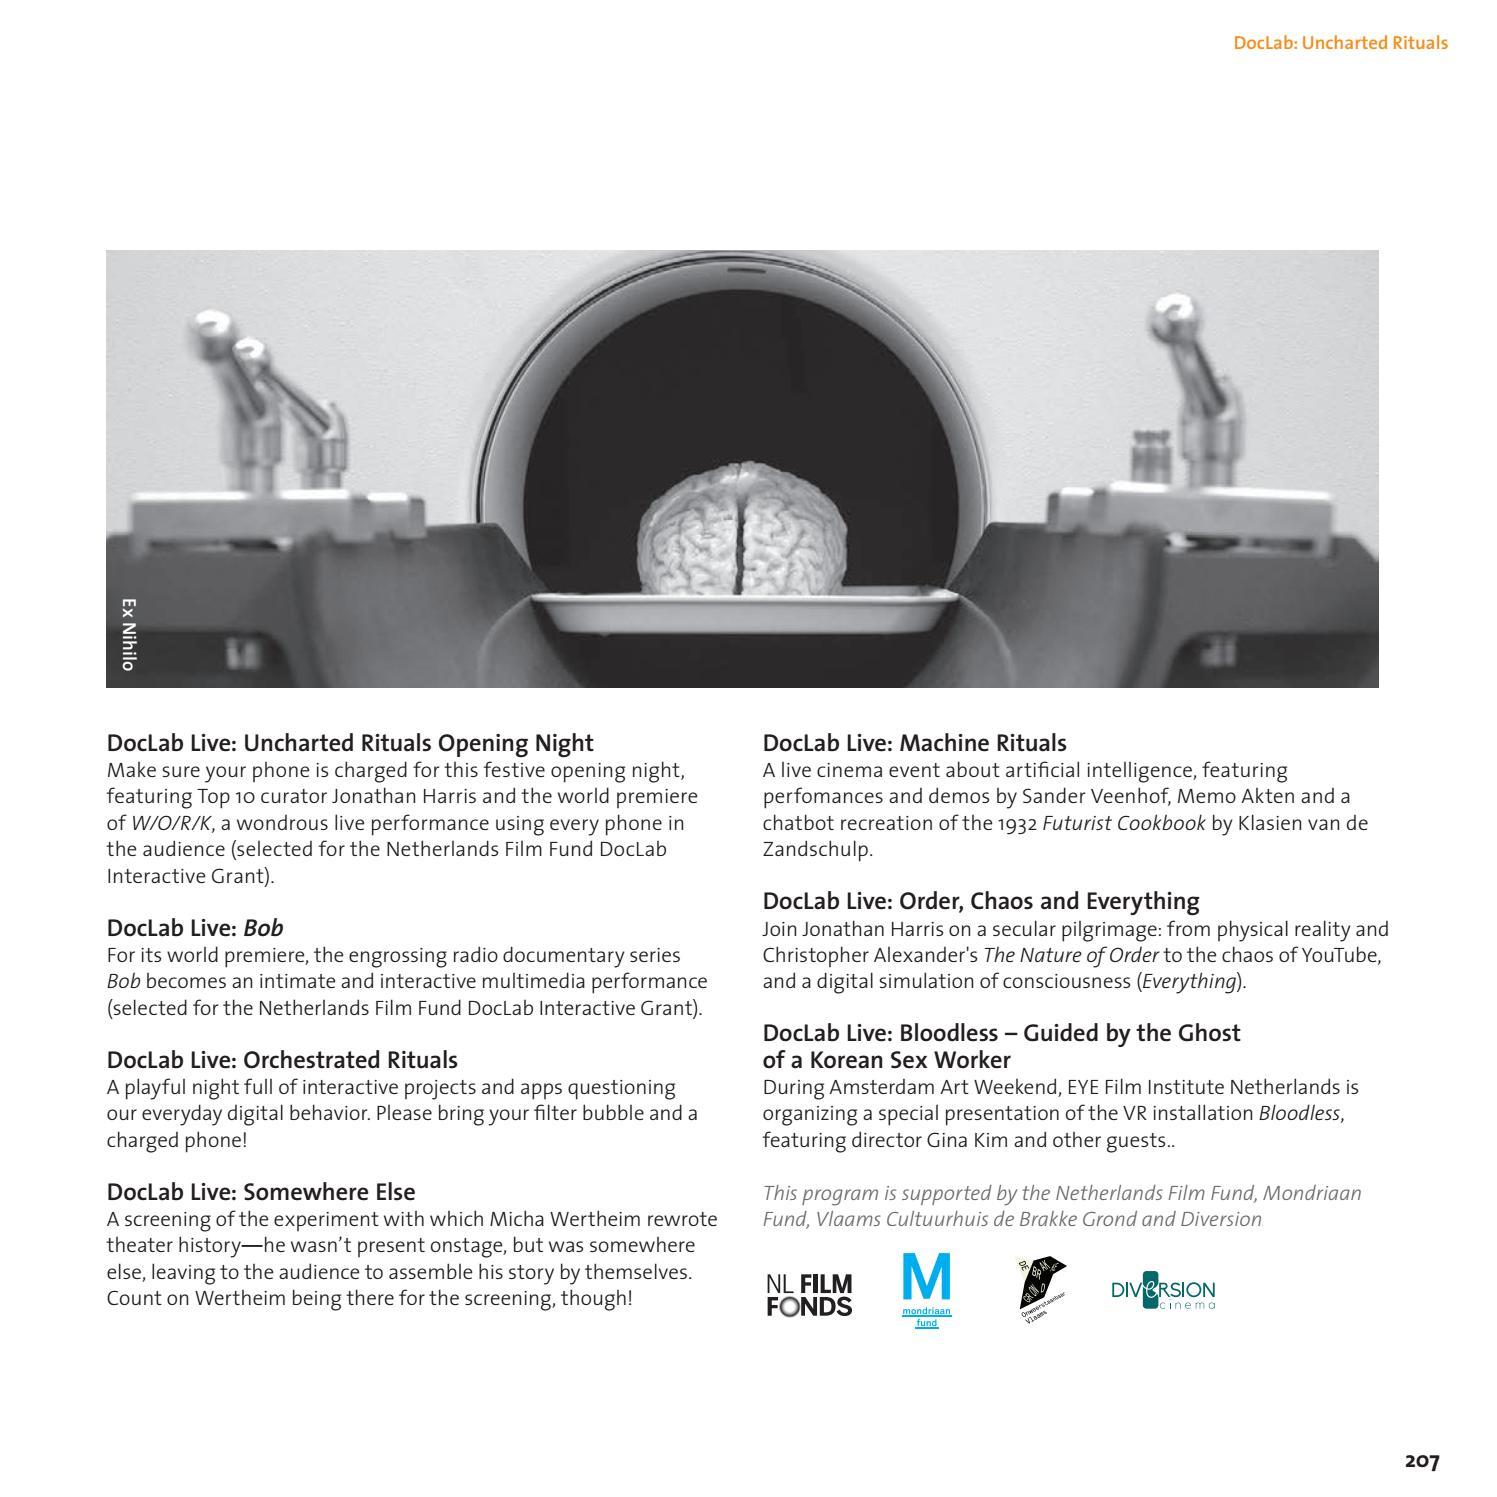 IDFA Catalogue 2017 by IDFA International Documentary Film